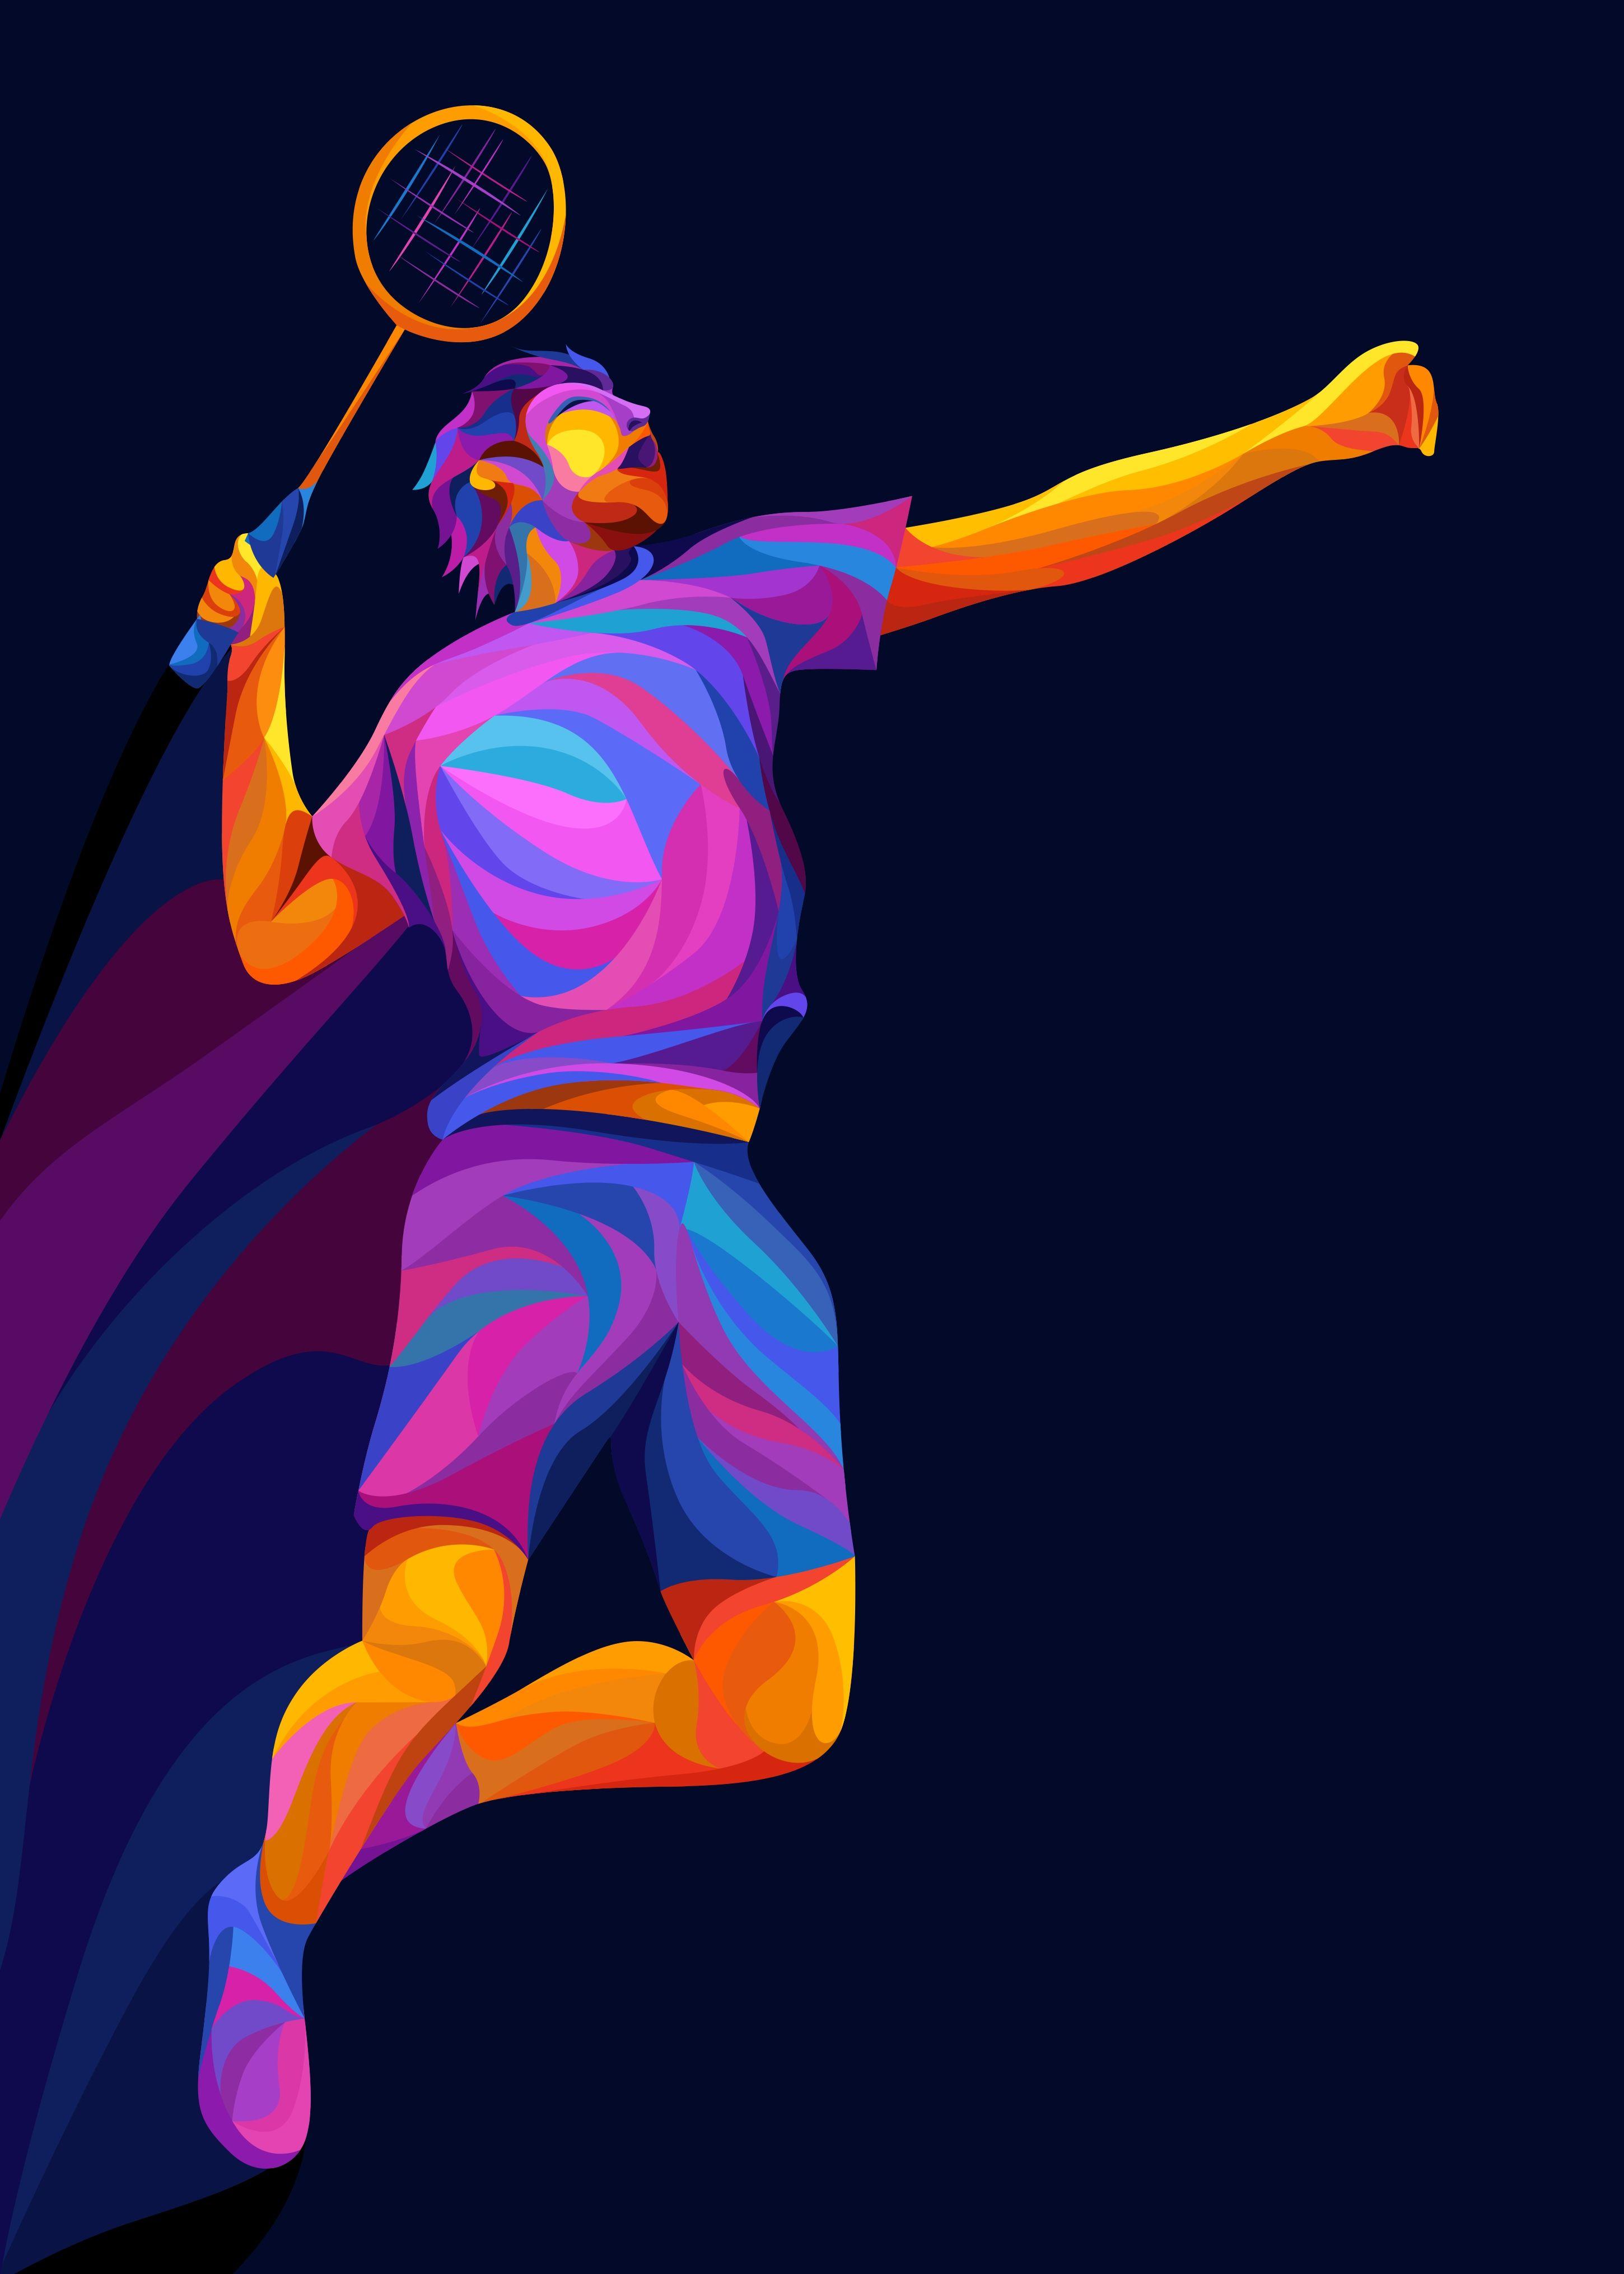 Badminton Poster Print By Dony Idham Sahadewa Displate In 2020 Badminton Sport Badminton Badminton Smash